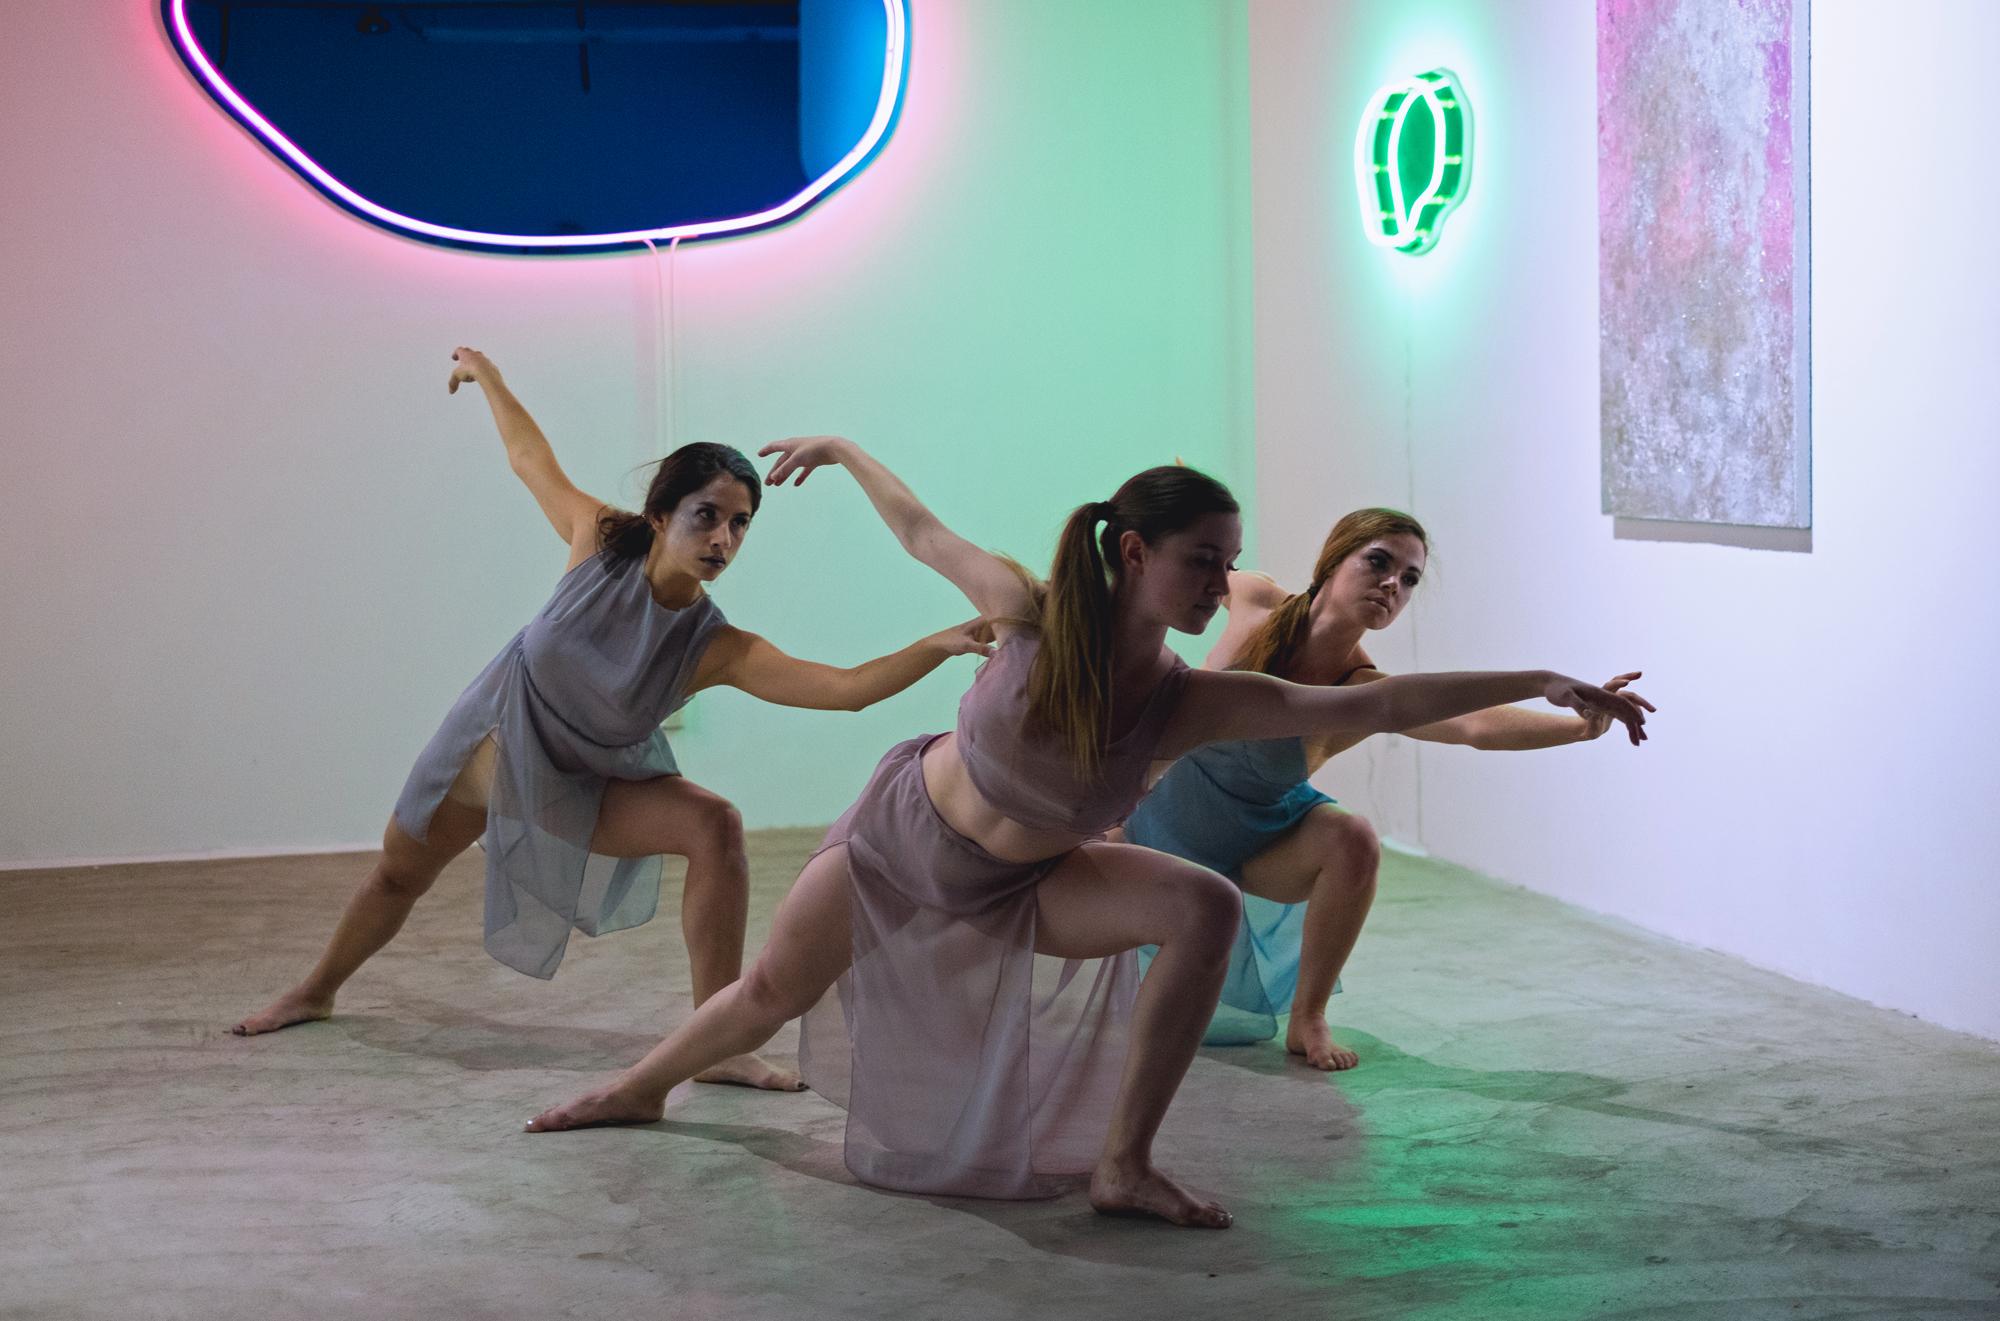 Multitudes in B Major - Choreographer : Thea BautistaDancers : Thea Bautista, Sarah Le Guenno, Catherine WalshMusic :Caprice Viennois by Fritz KreislerPhoto : Lanna Apisukh2017